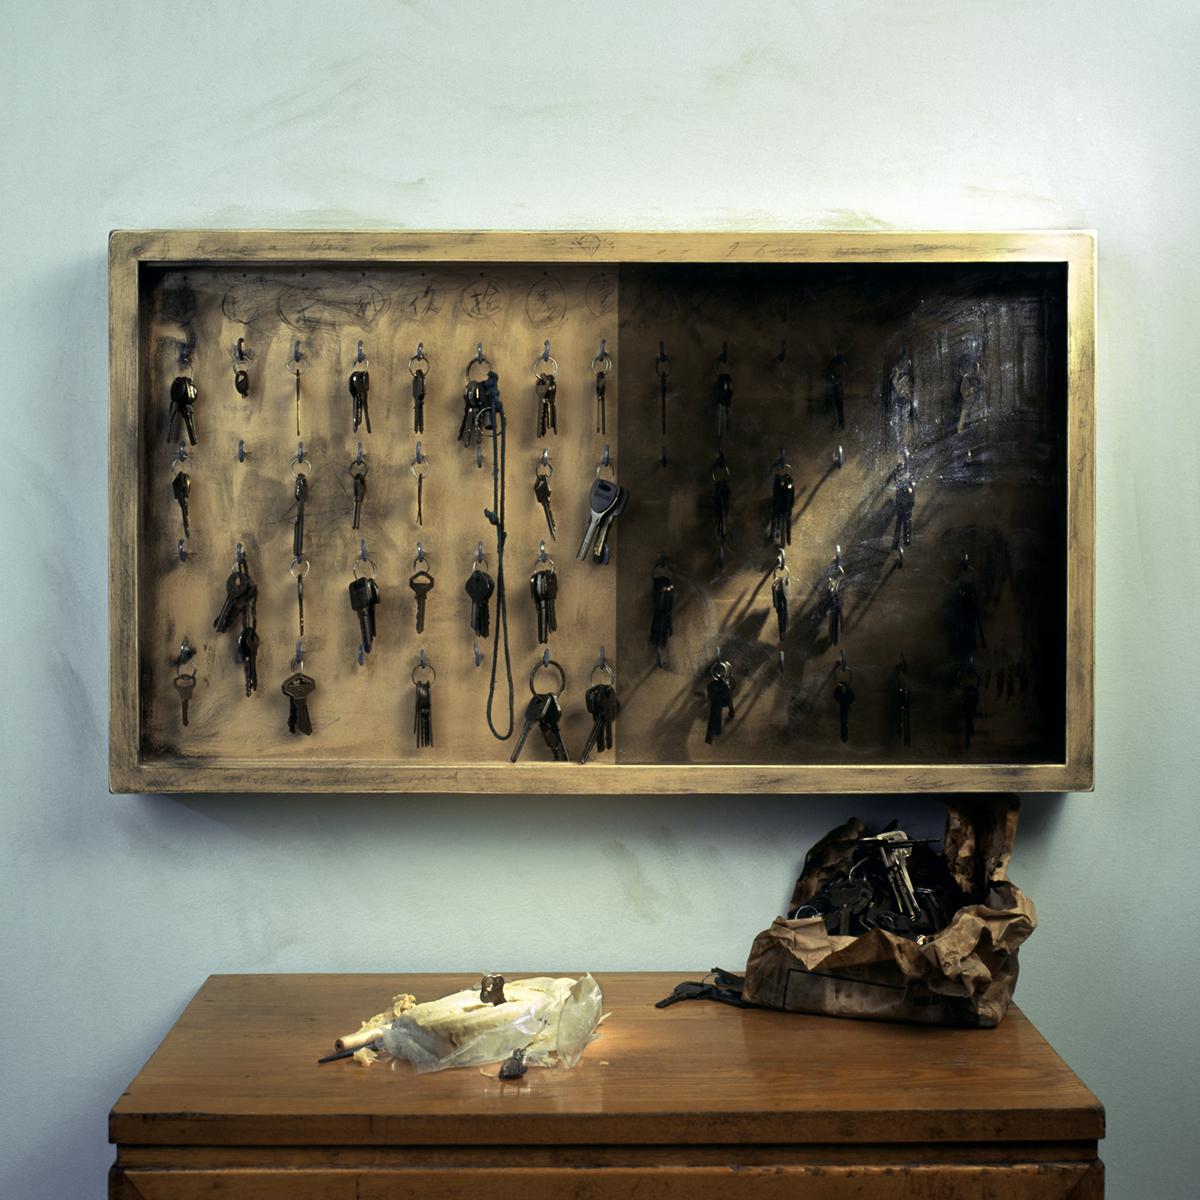 Chen Wei 陈维, The Augur's Game No.4, 2007, Archival inkjet print 收藏级艺术微喷, 80 x 80 cm